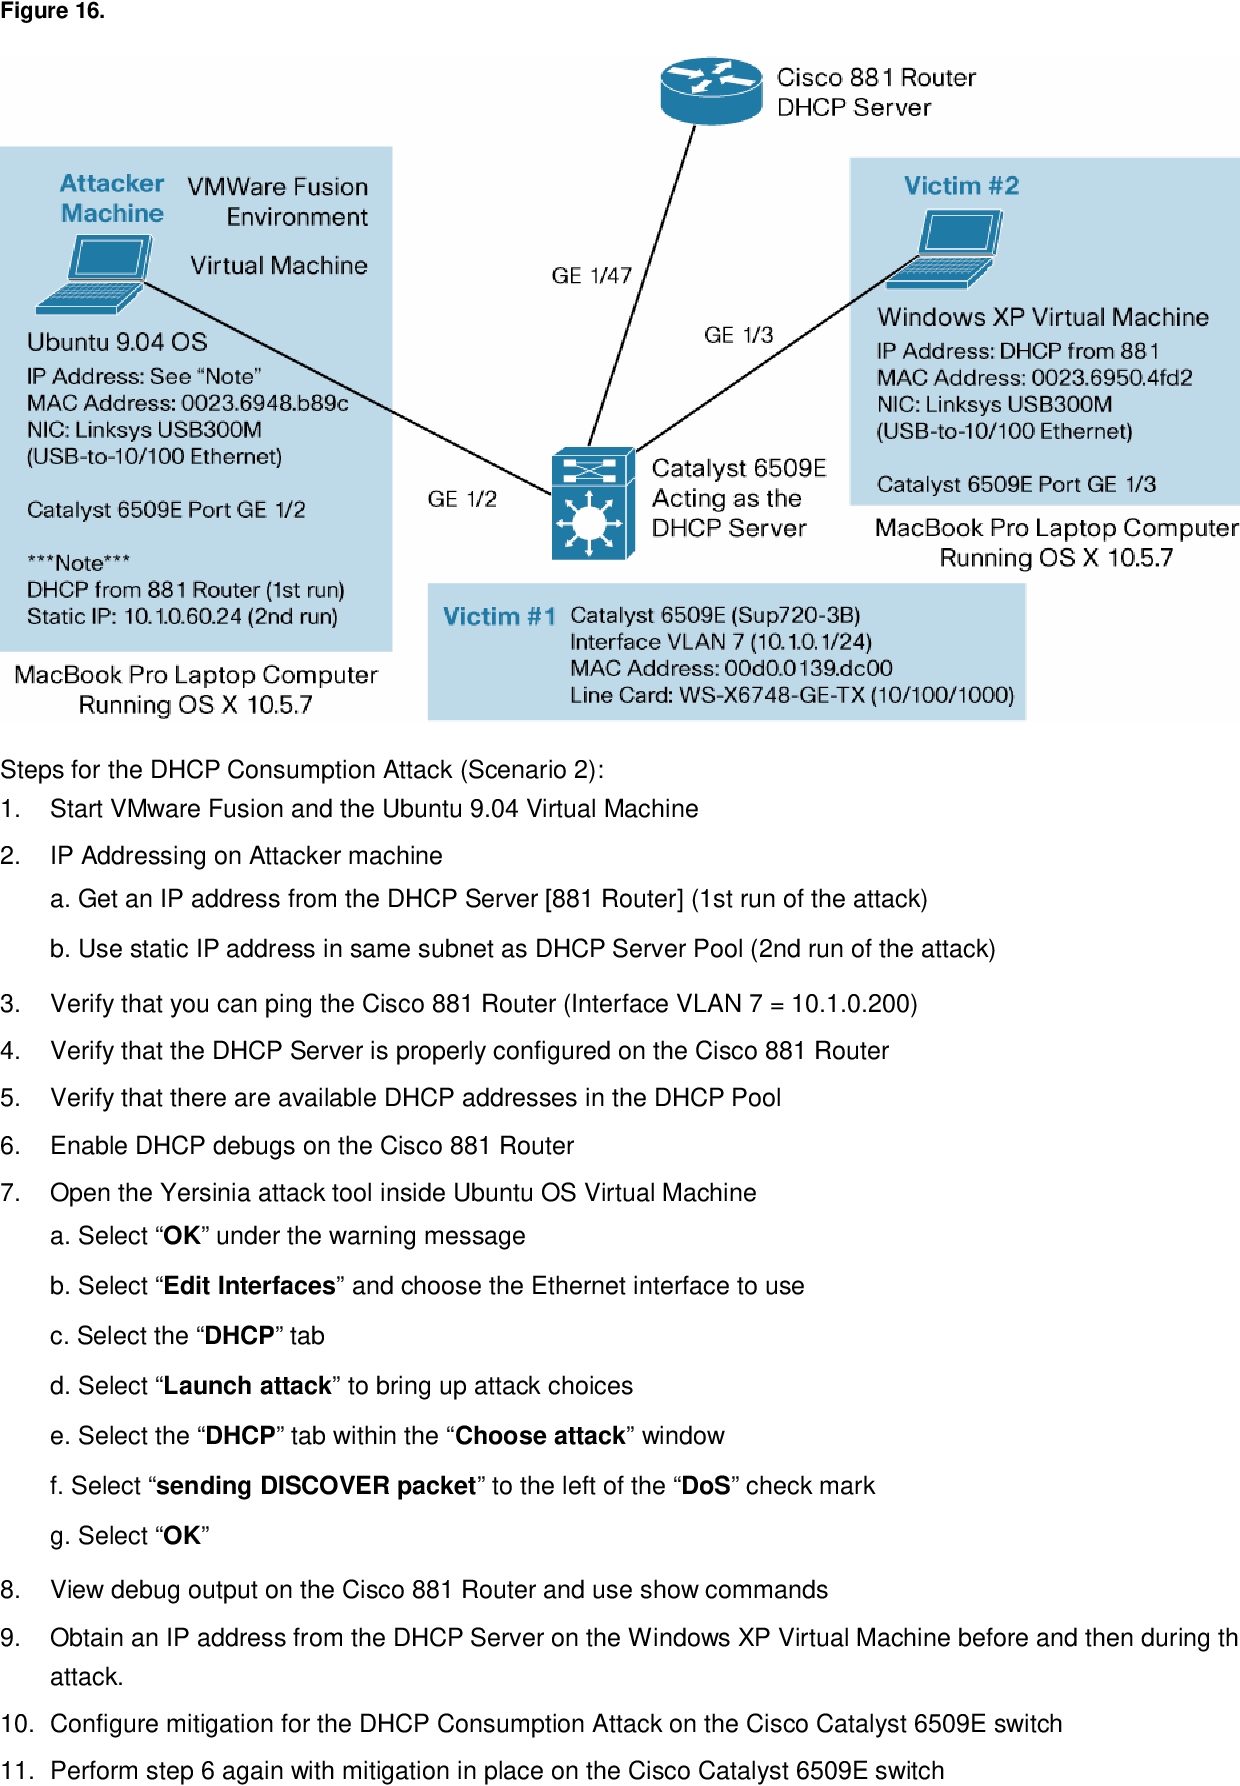 PDF] Layer 2 Attacks and Mitigation Techniques for the Cisco